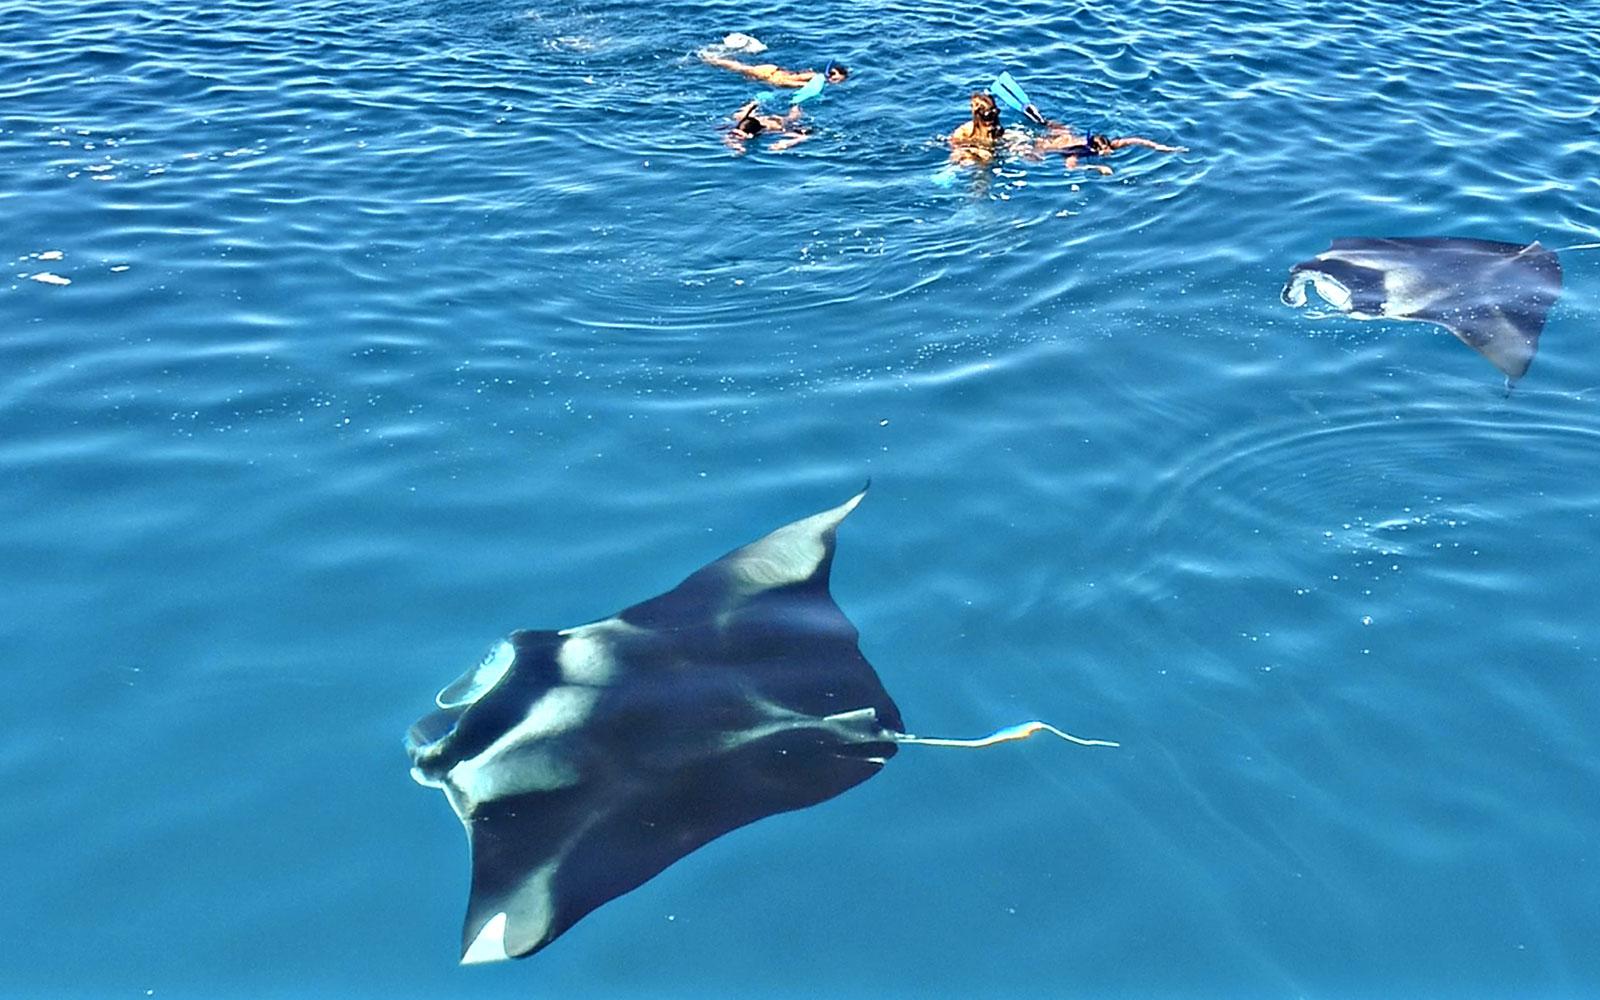 Maldive_271119_1452.jpg